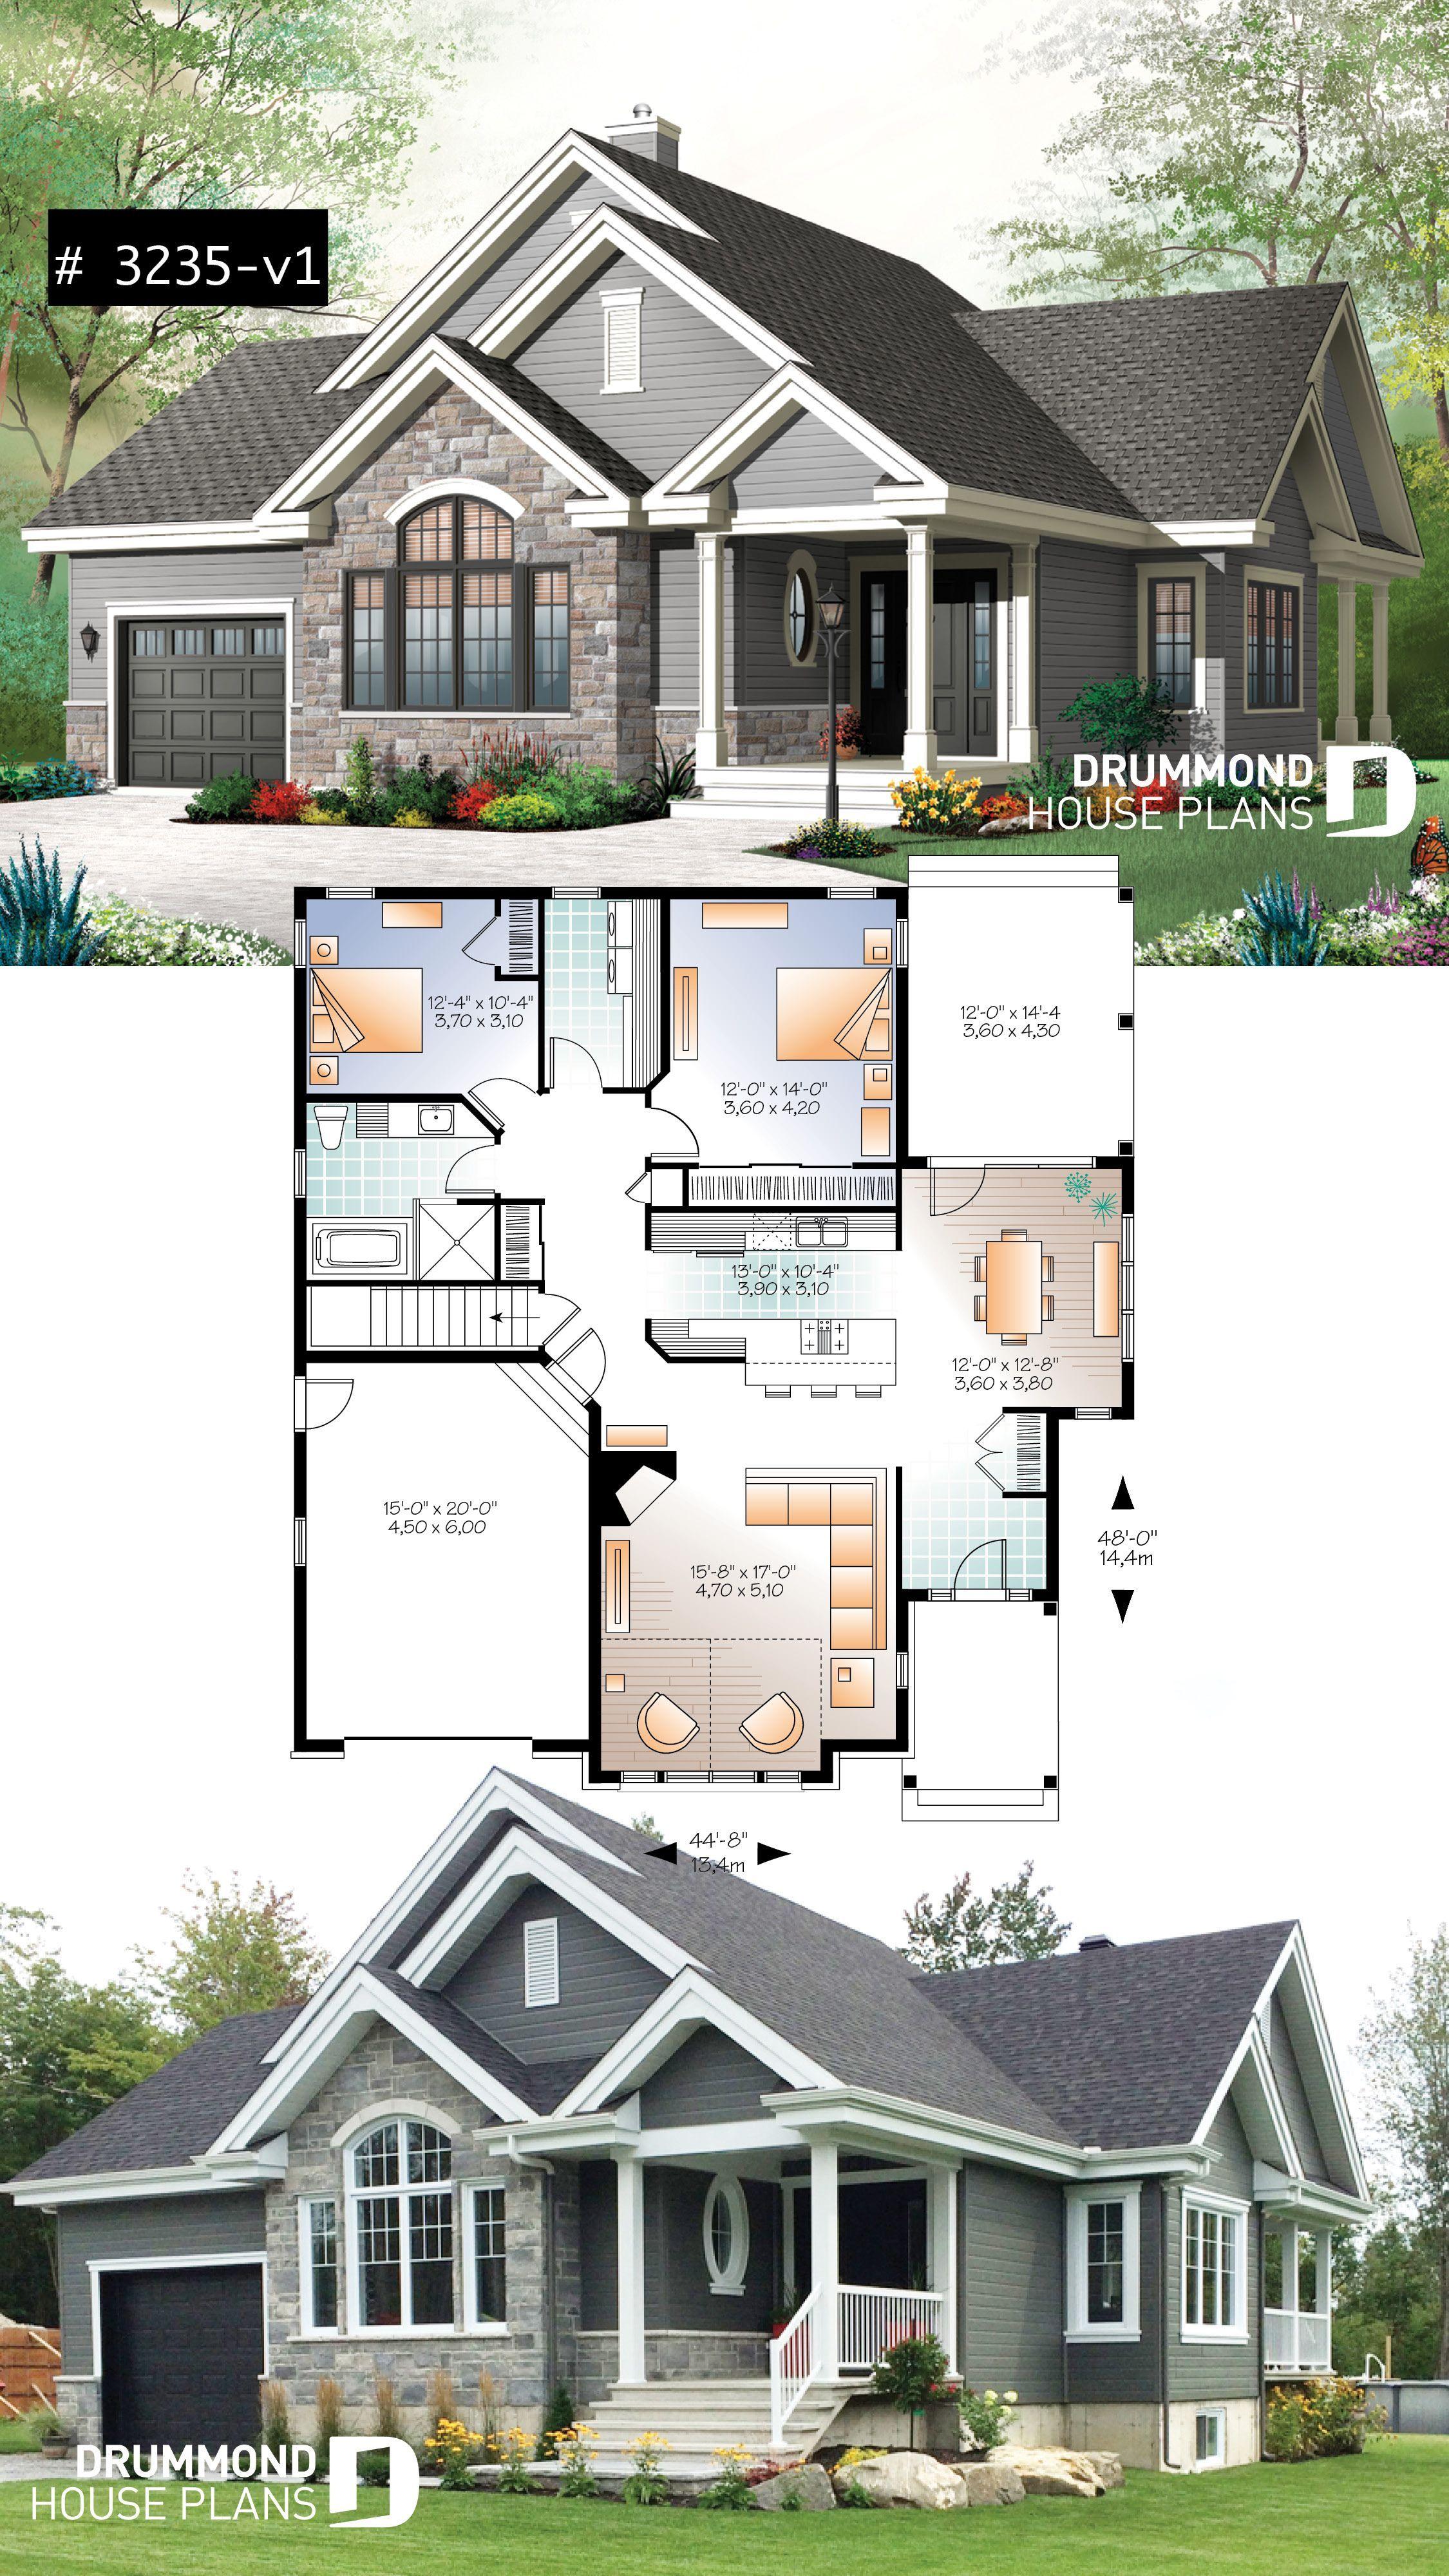 Open Concept Floor Plan For Ranch Ranch With A Spacious Open Floor Plan Hwbdo13934 Cottage House Ranch House Plans Floor Plans Small House Plans